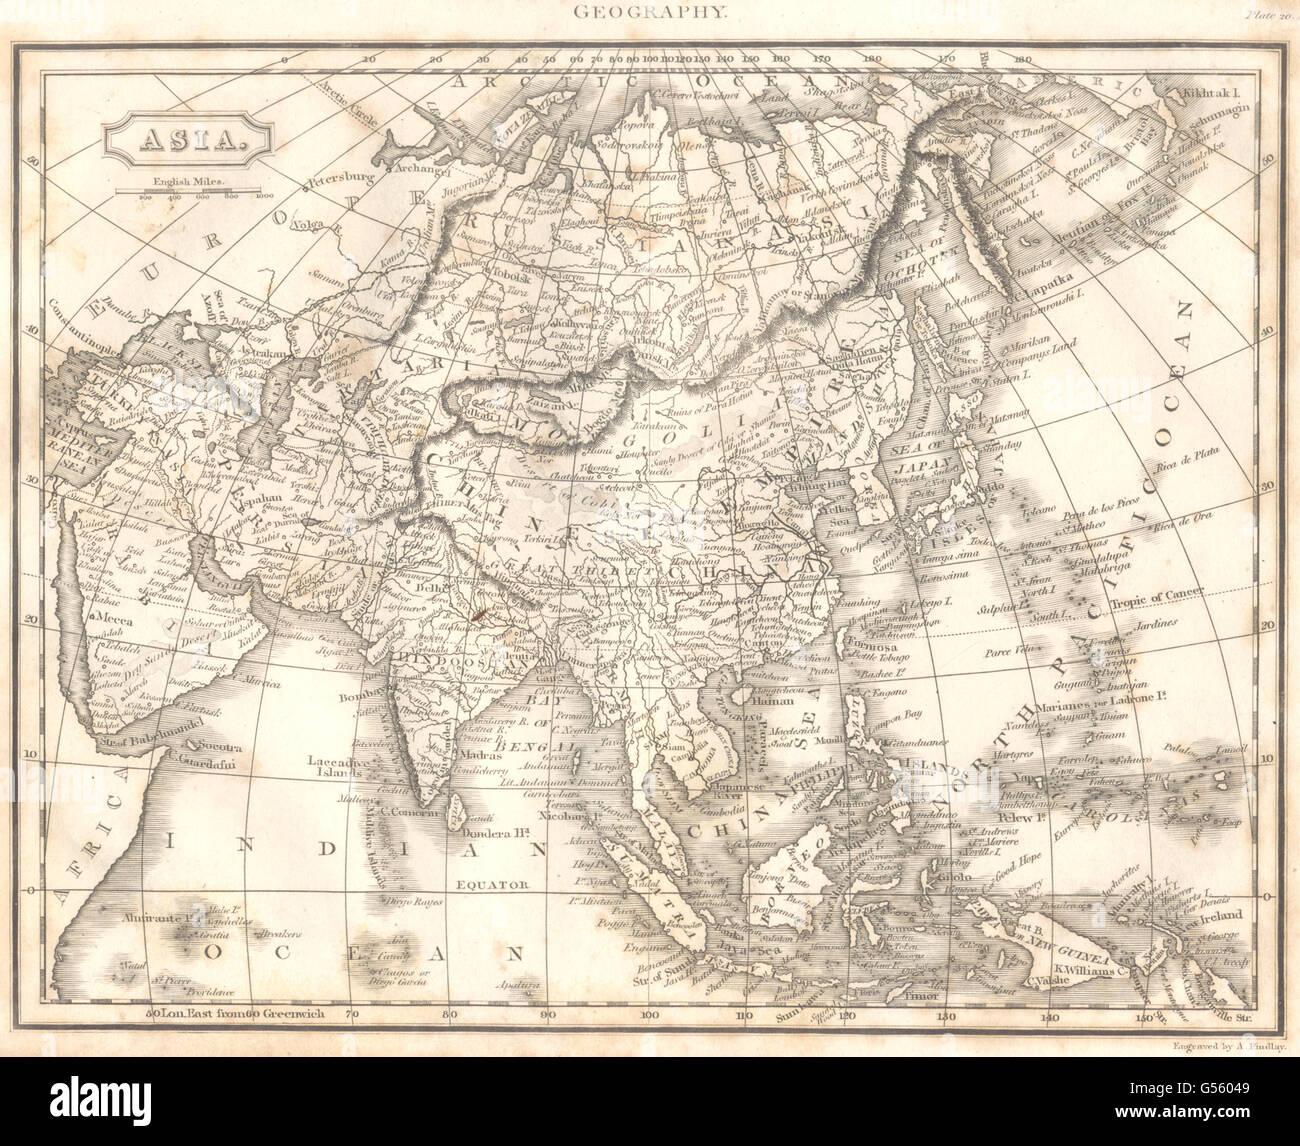 ASIAArabia PersiaIranHindoostan China Malaya Japan Stock Photo - Japan map equator